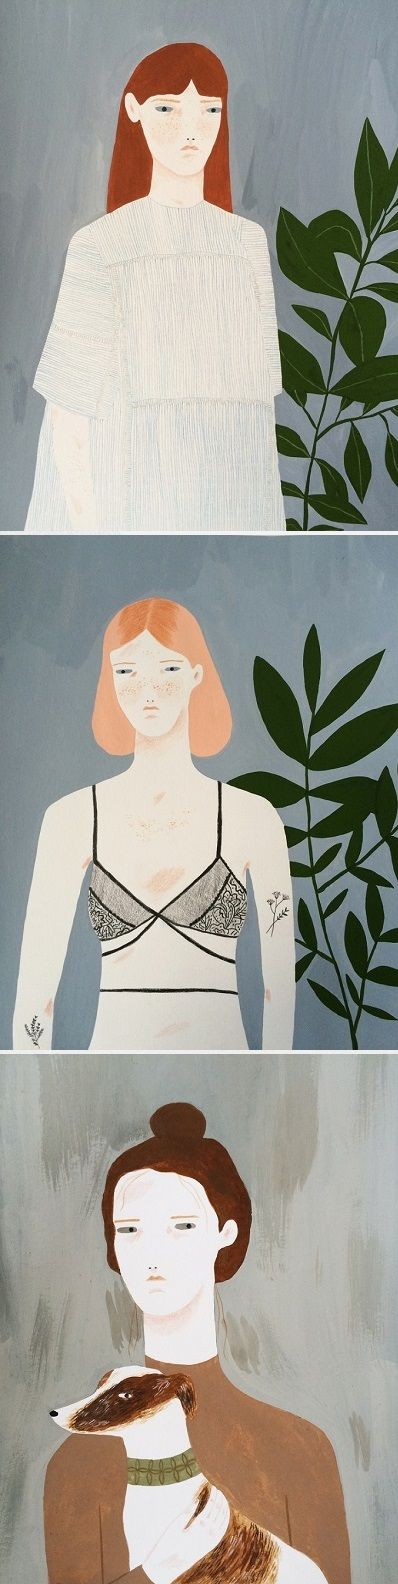 Illustrations by Alessandra Genualdo / On the Blog!